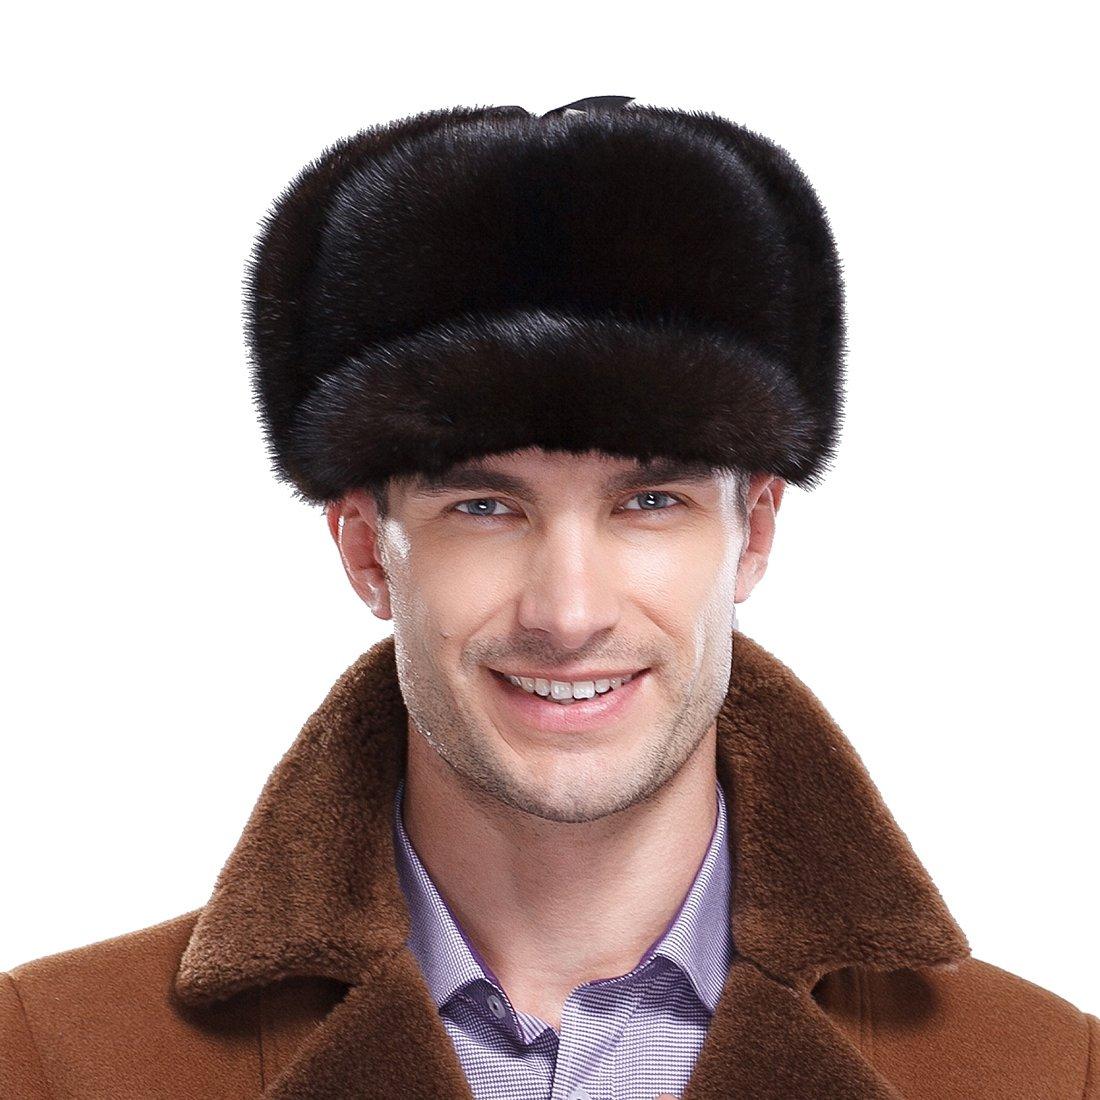 URSFUR Premium Mink Full Fur Hunting Hat Captain Hat (One Size, Natural Color) by URSFUR